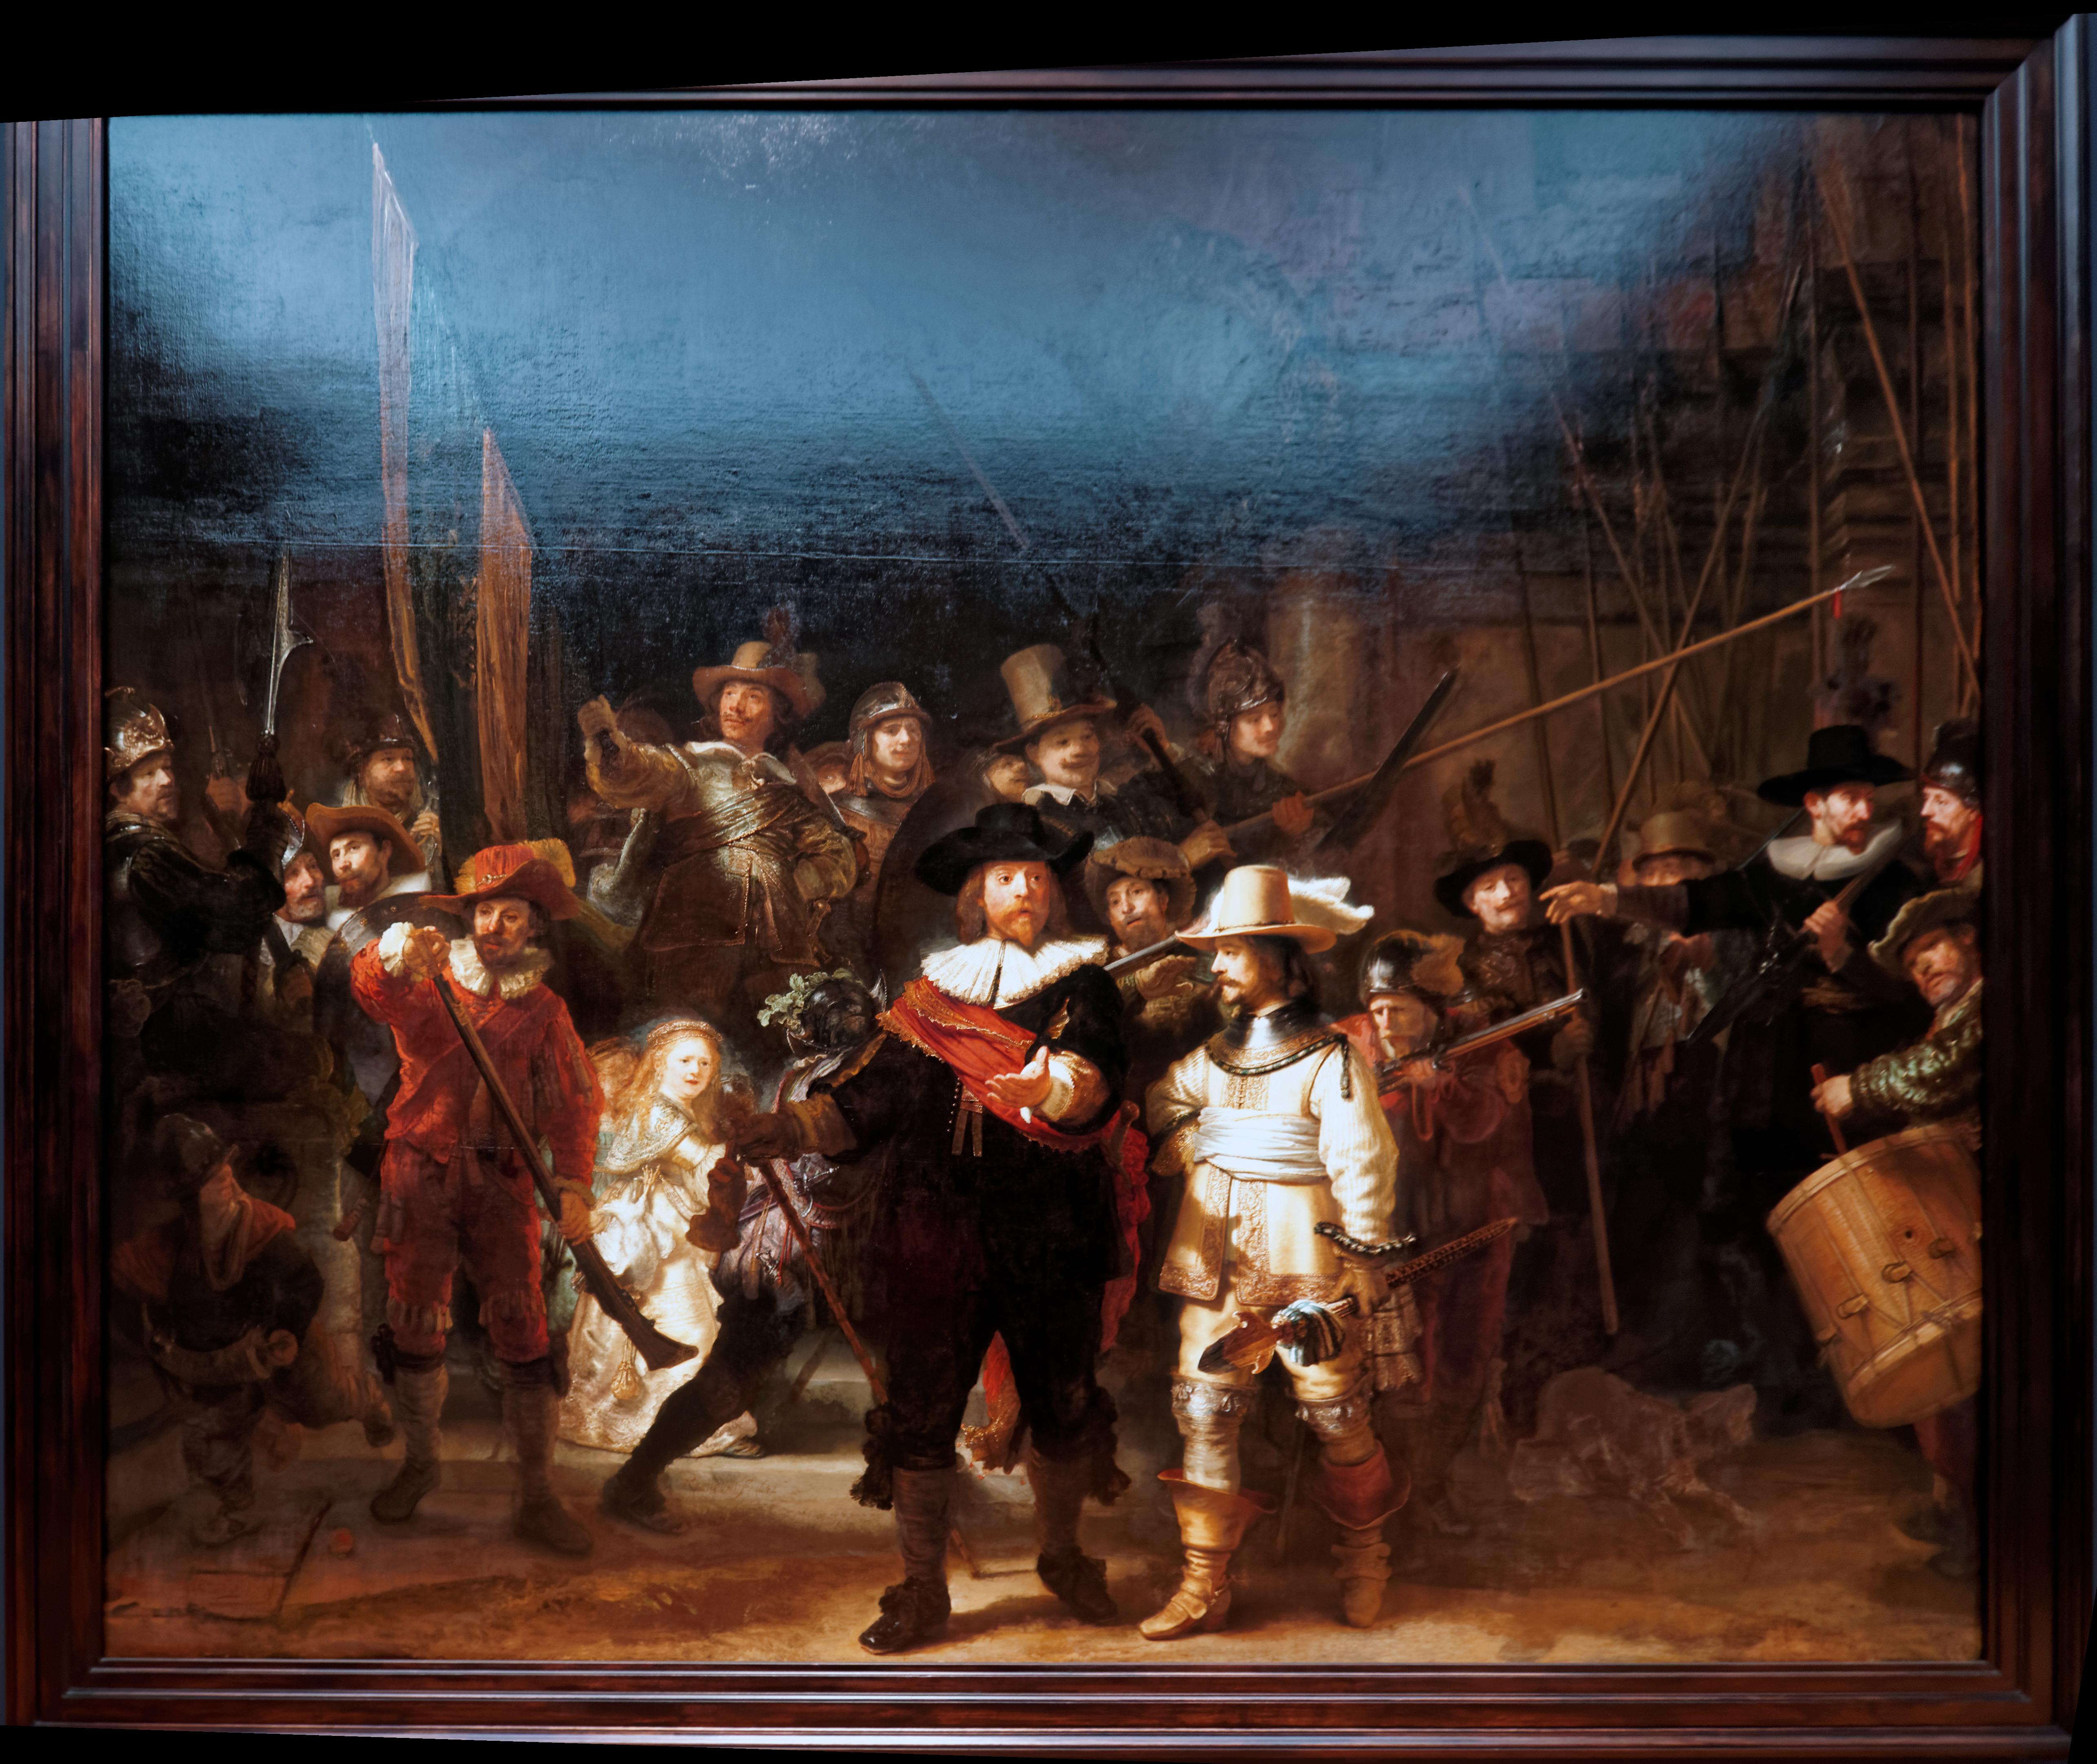 https://upload.wikimedia.org/wikipedia/commons/f/f0/Amsterdam_-_Rijksmuseum_1885_-_The_Gallery_of_Honour_%281st_Floor%29_-_De_Nachtwacht_-_The_Night_Watch_1642_by_Rembrandt_van_Rijn.jpg